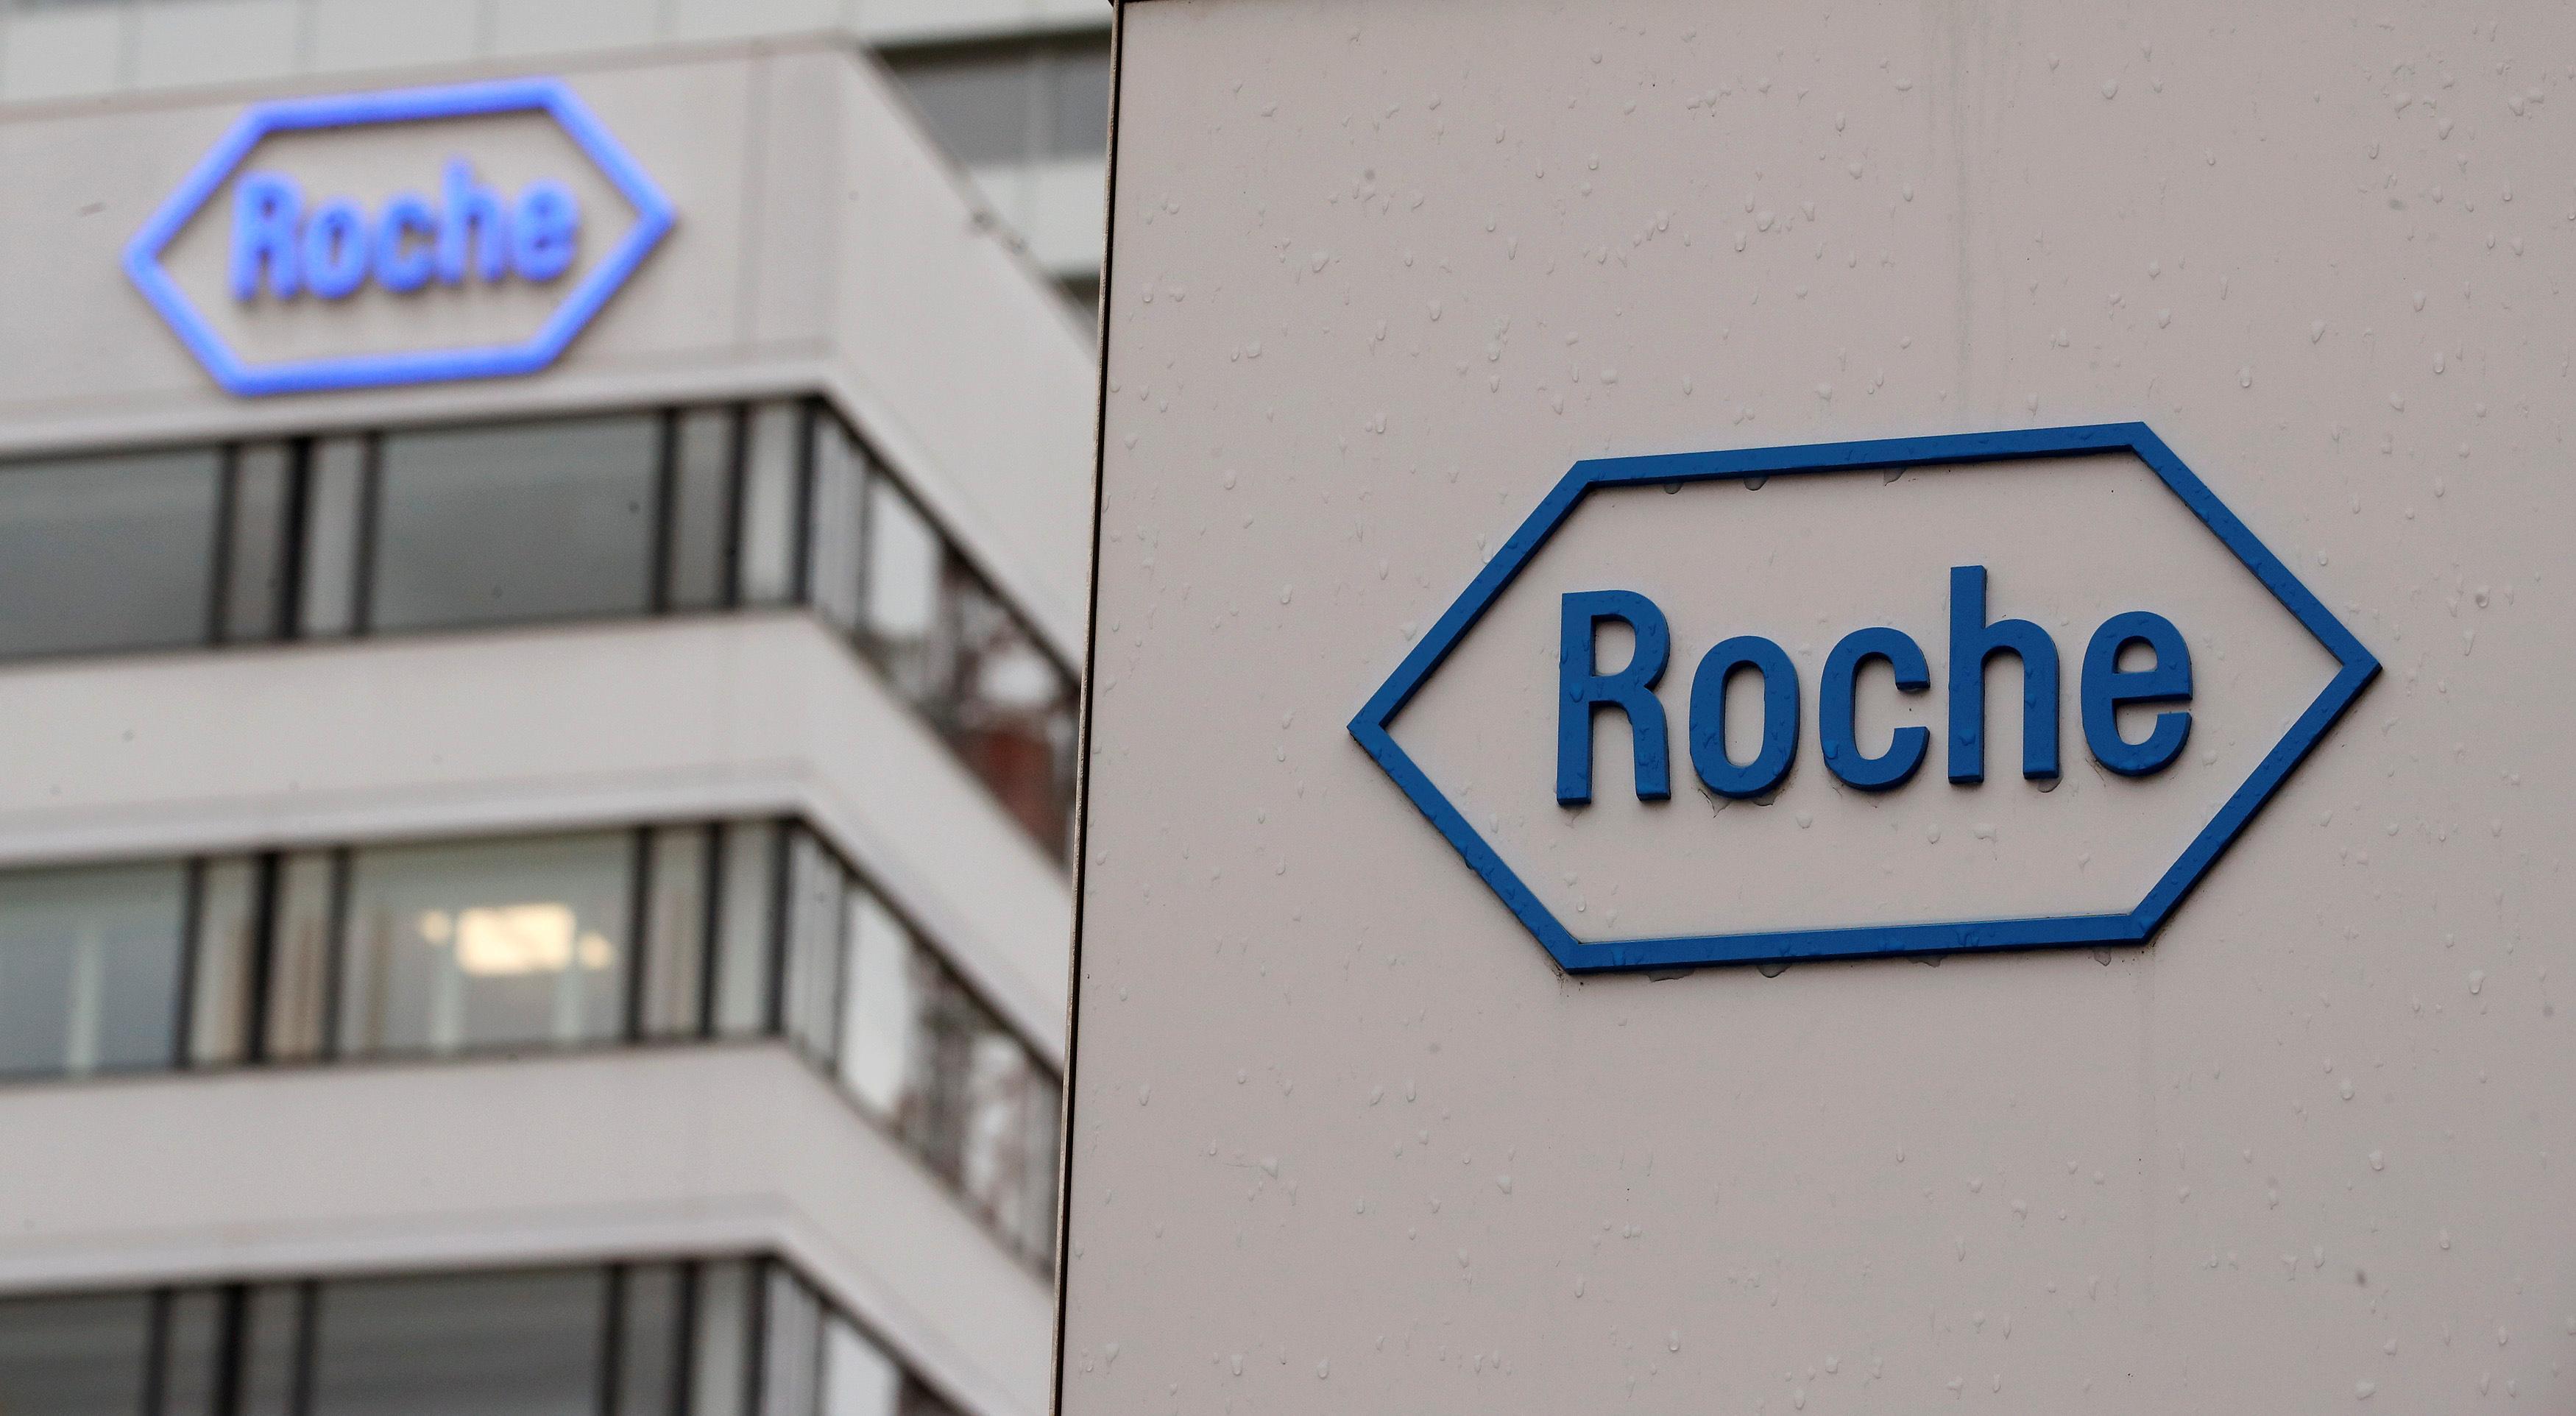 Roche says one-dose Xofluza flu drug as good as older Tamiflu in kids